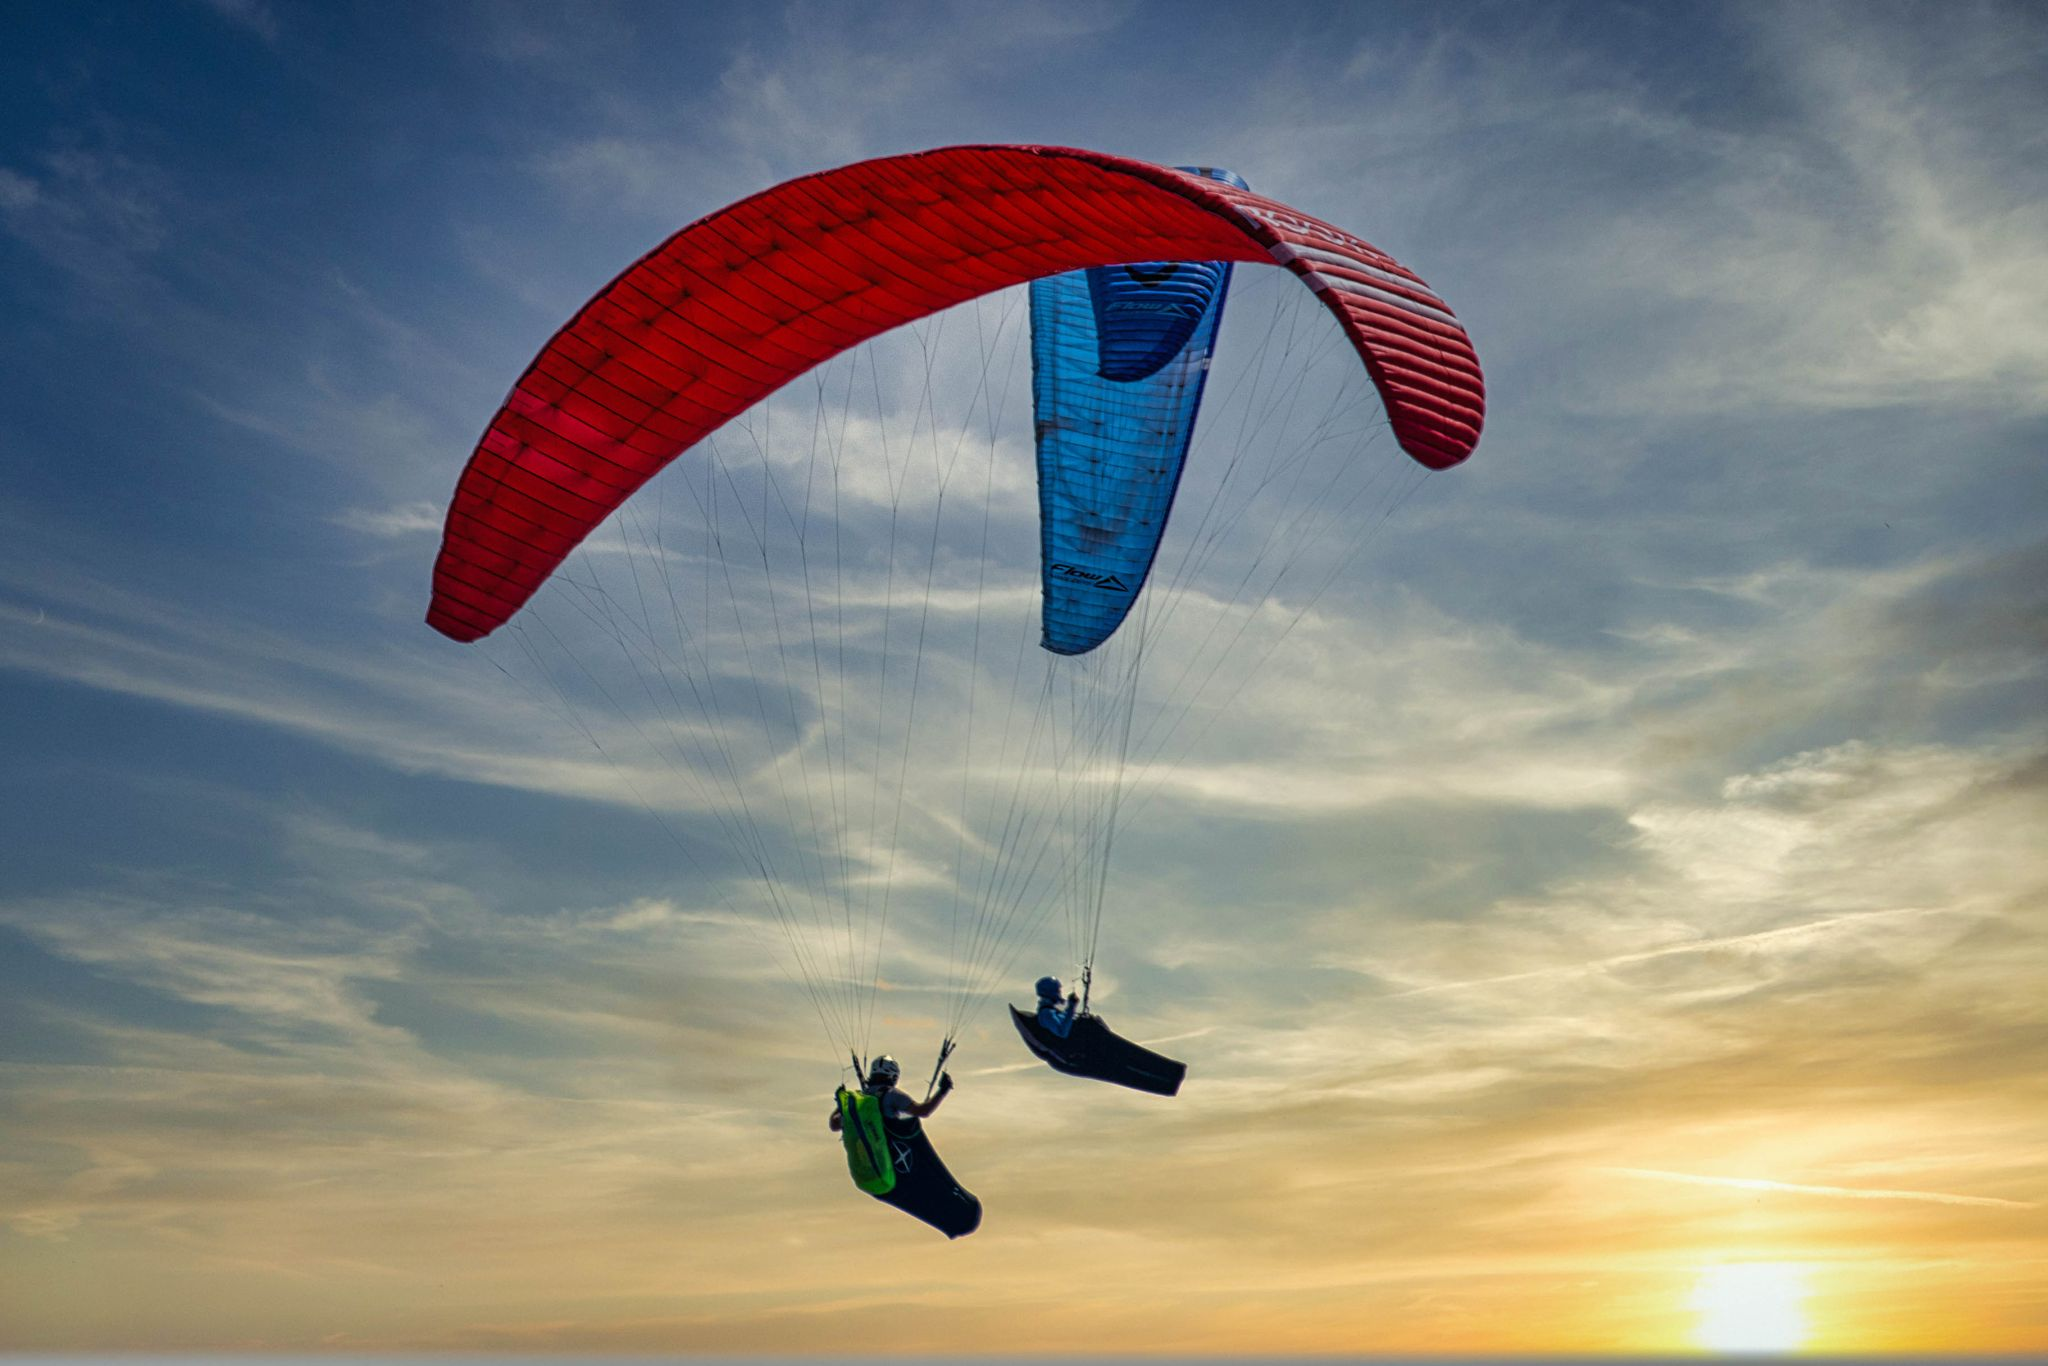 Parragliders Mona Vale headland, Northern Beaches, Australia